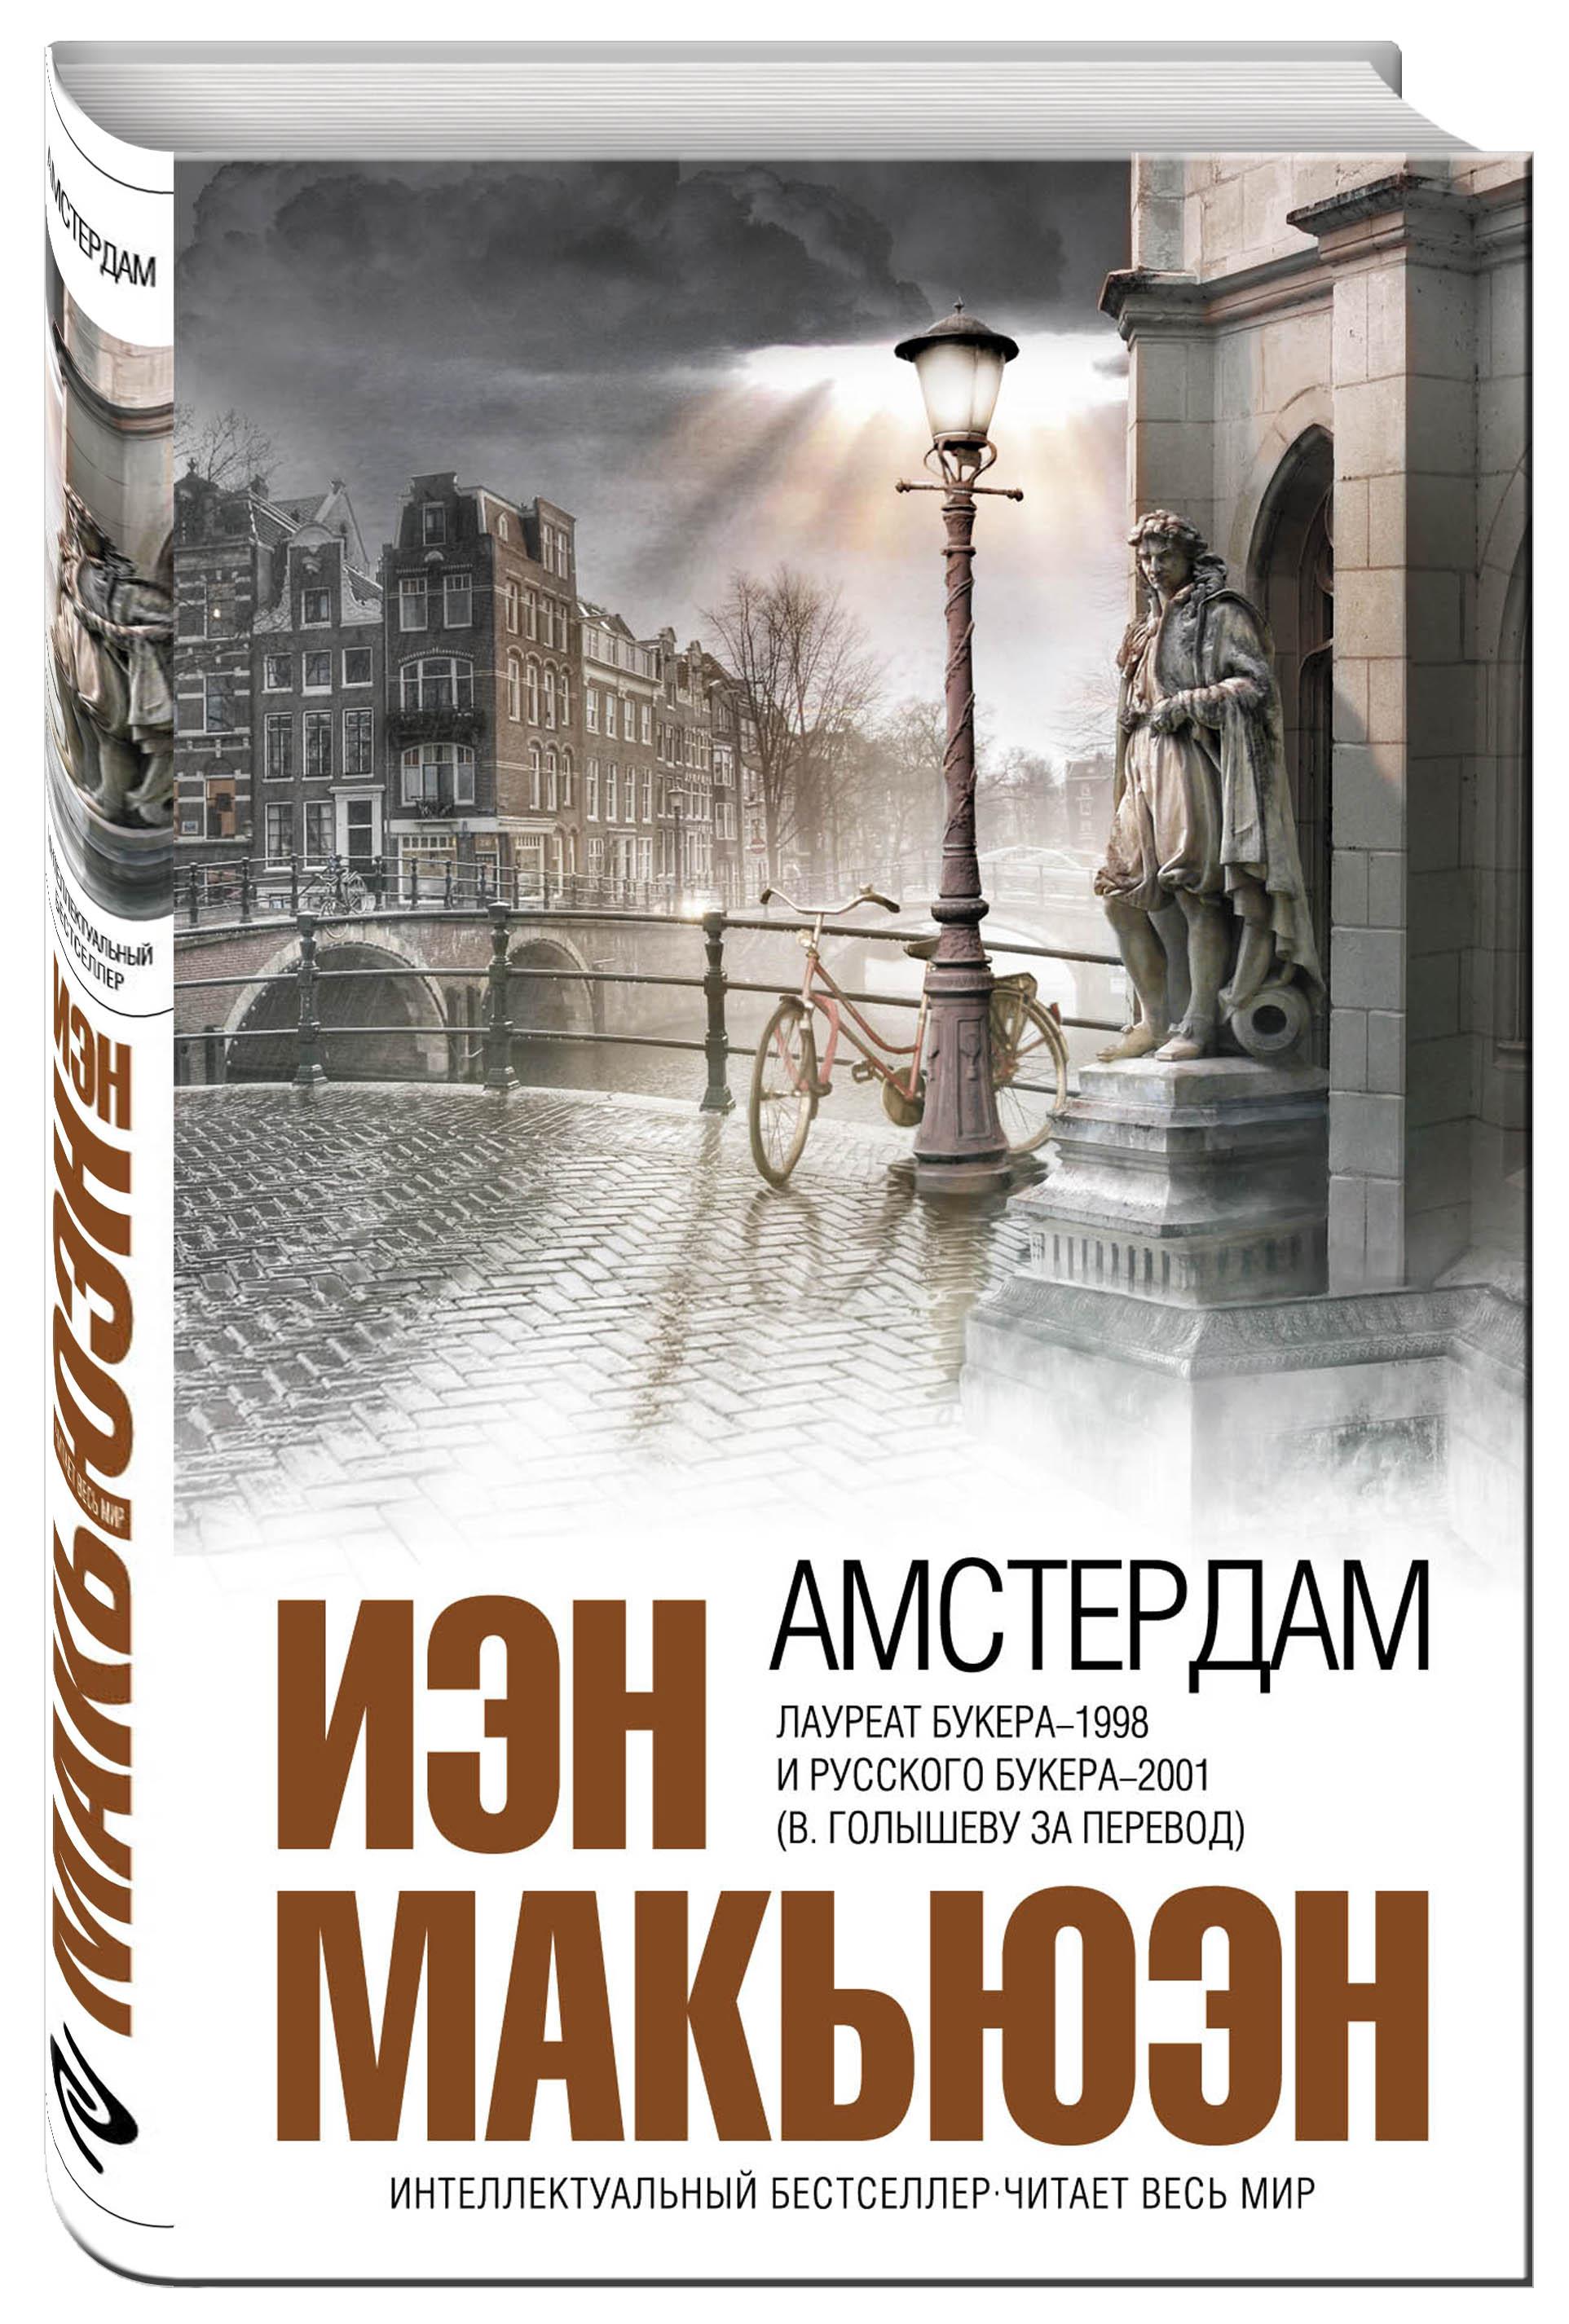 Иэн макьюэн амстердам скачать книгу